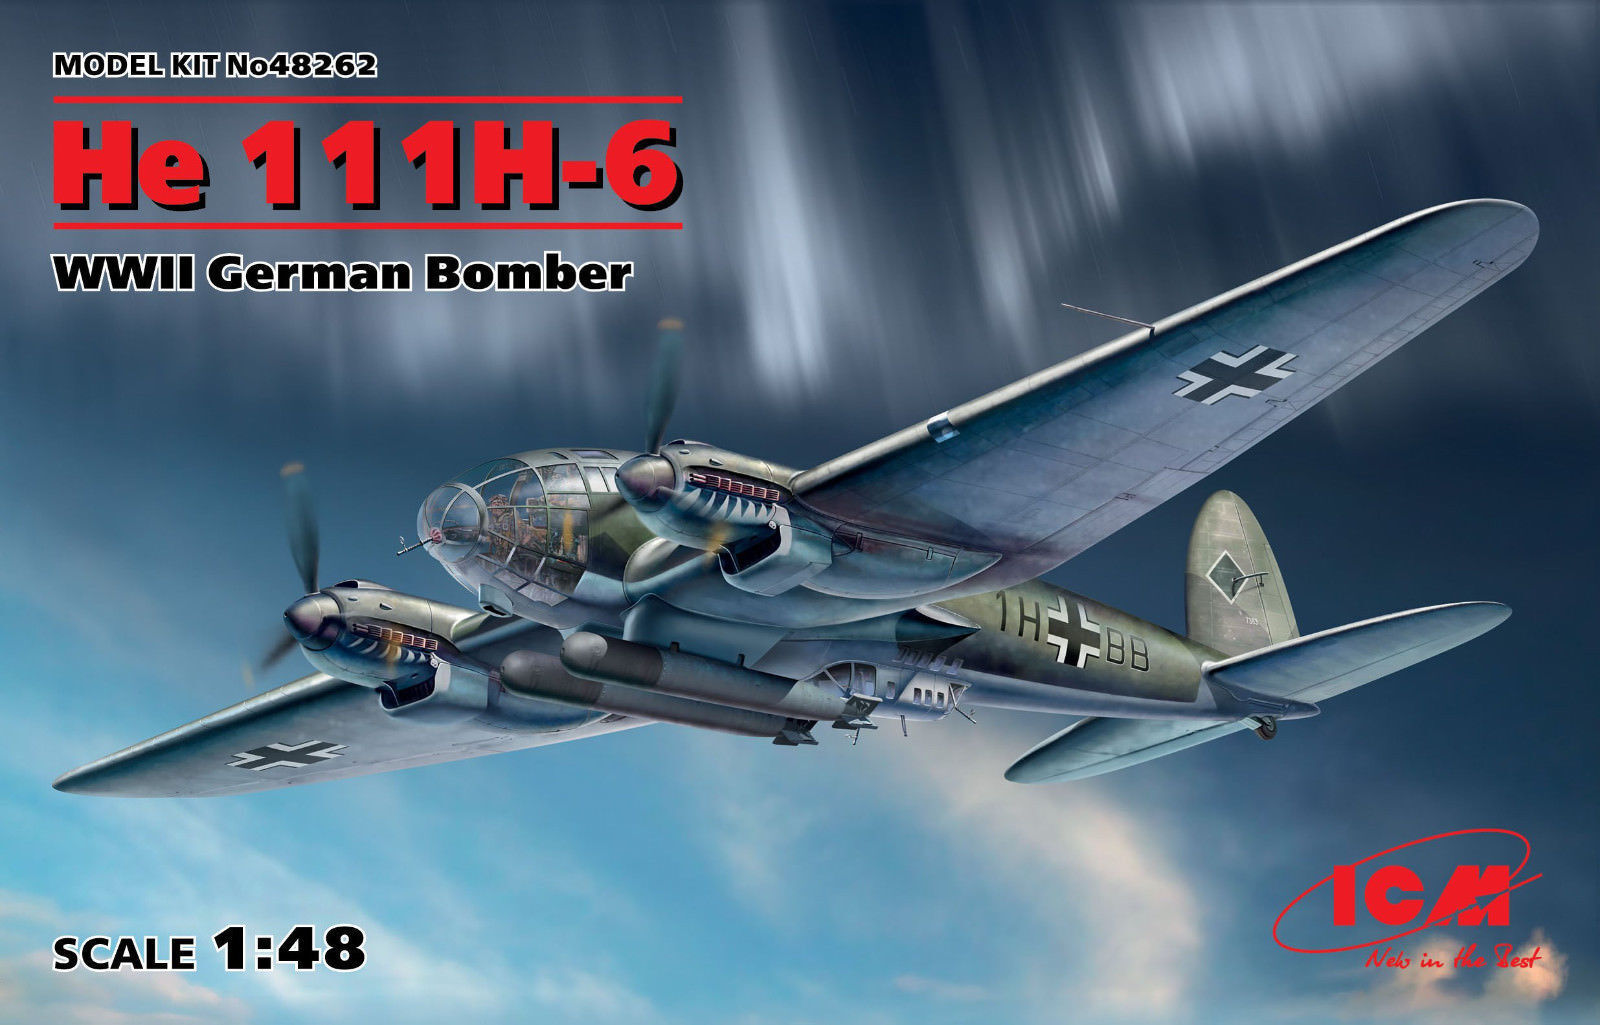 ICM Heinkel LUI 111H-6 WWII German Bomber TELONE 1:48 Kit di costruzione 48262